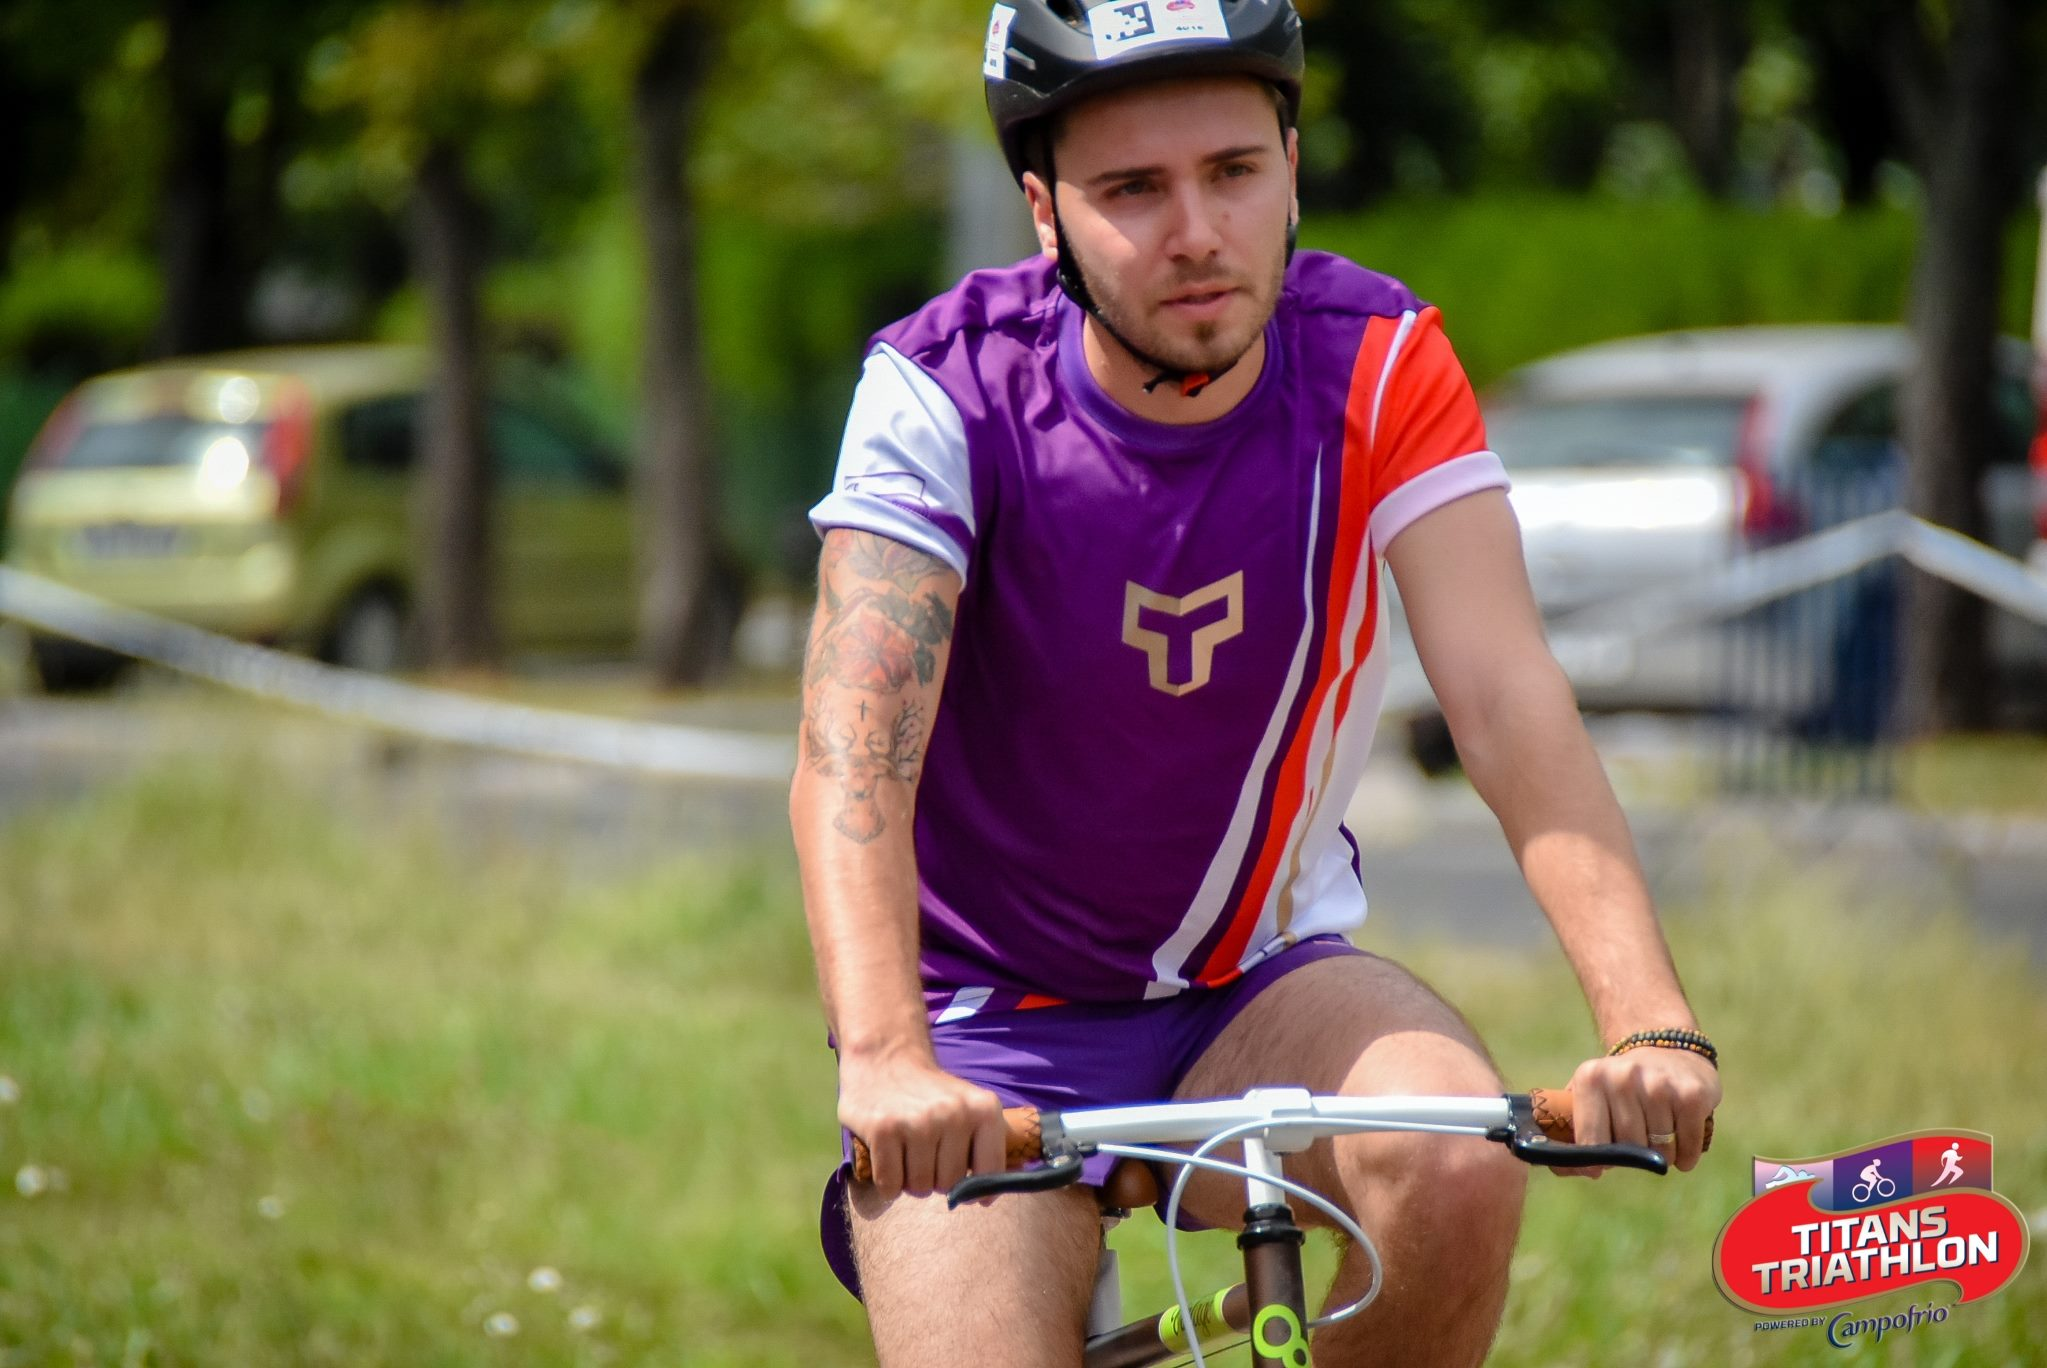 DaddyCool triatlon